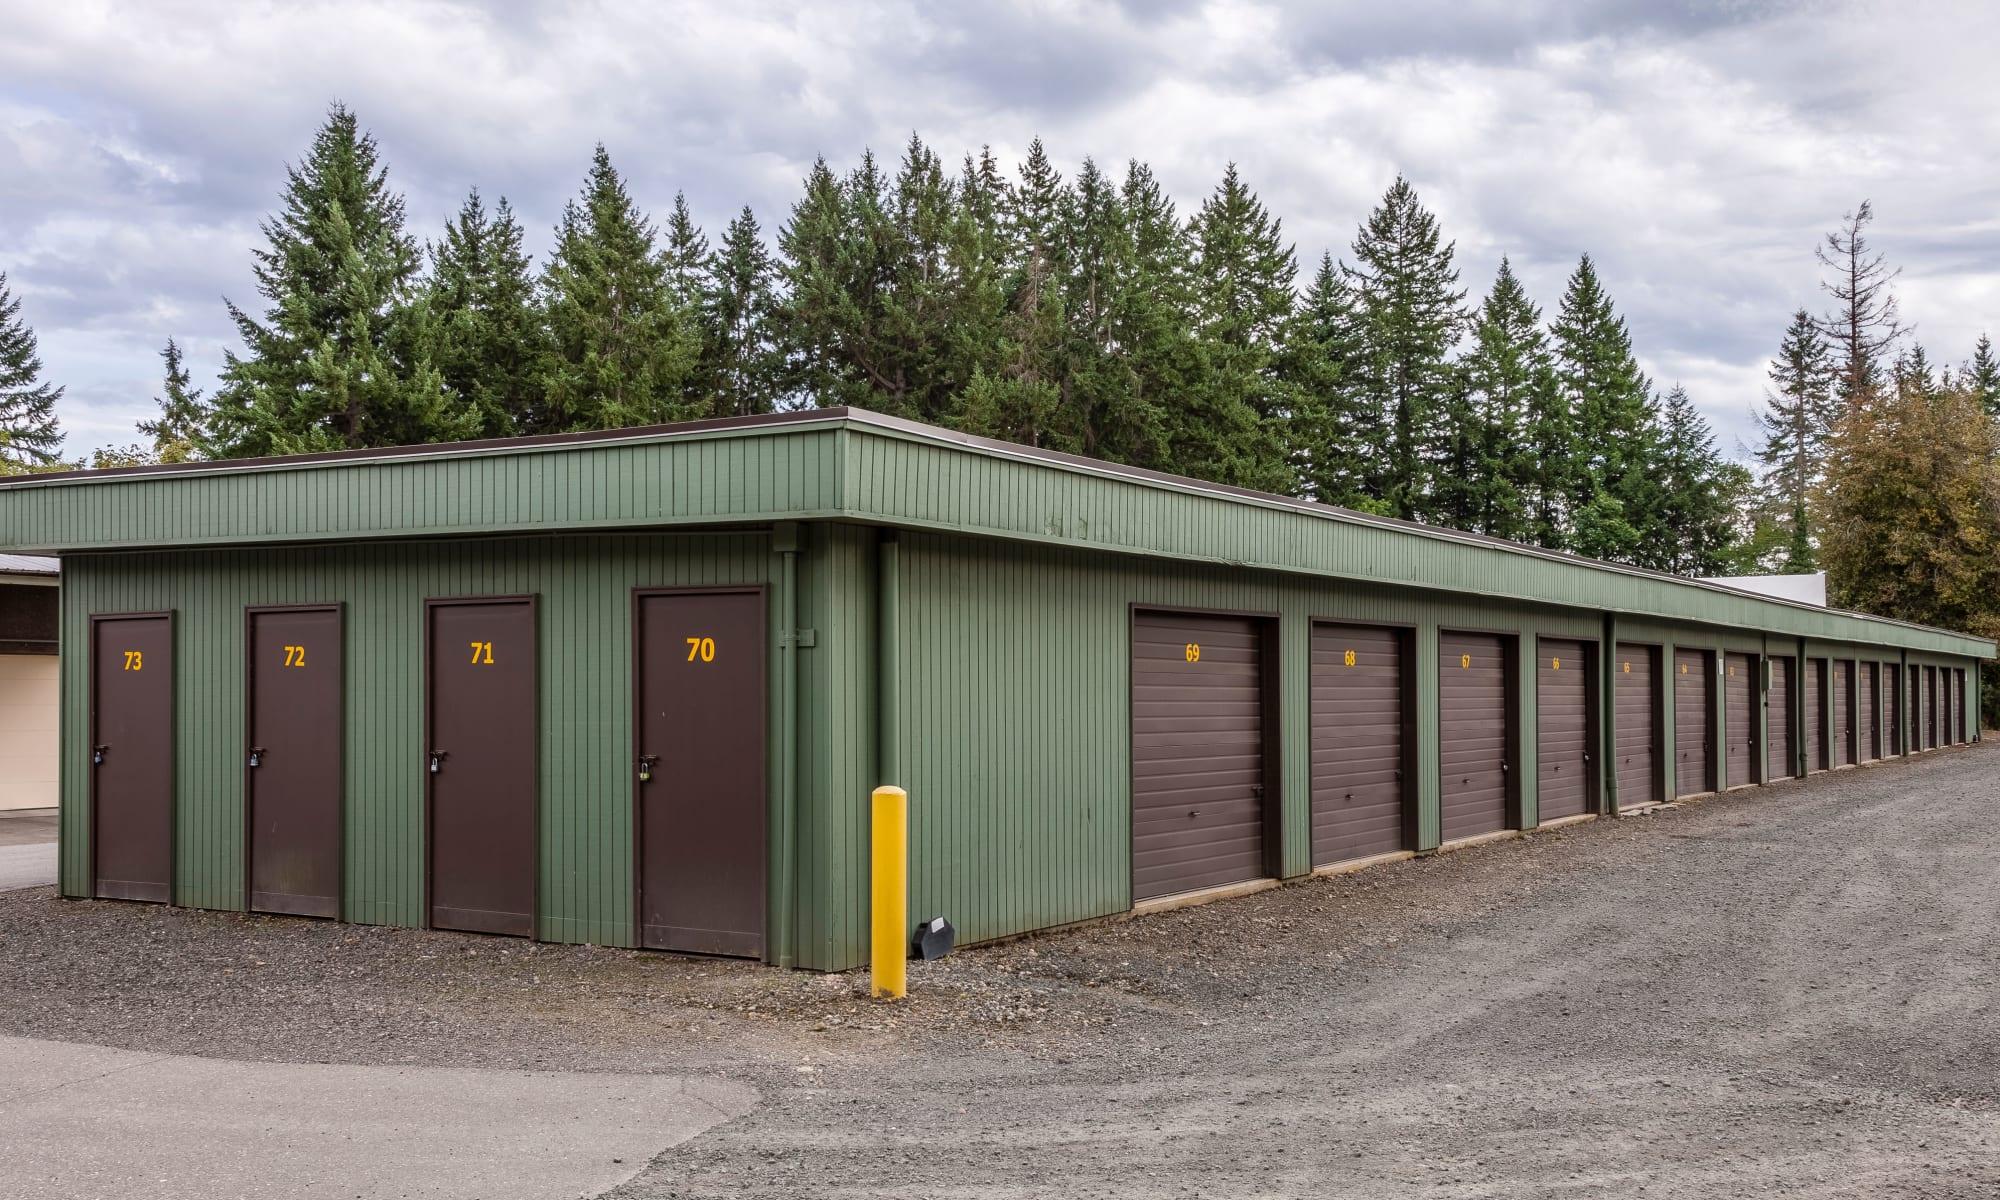 Self storage at Bainbridge North Storage in Bainbridge Island, Washington.